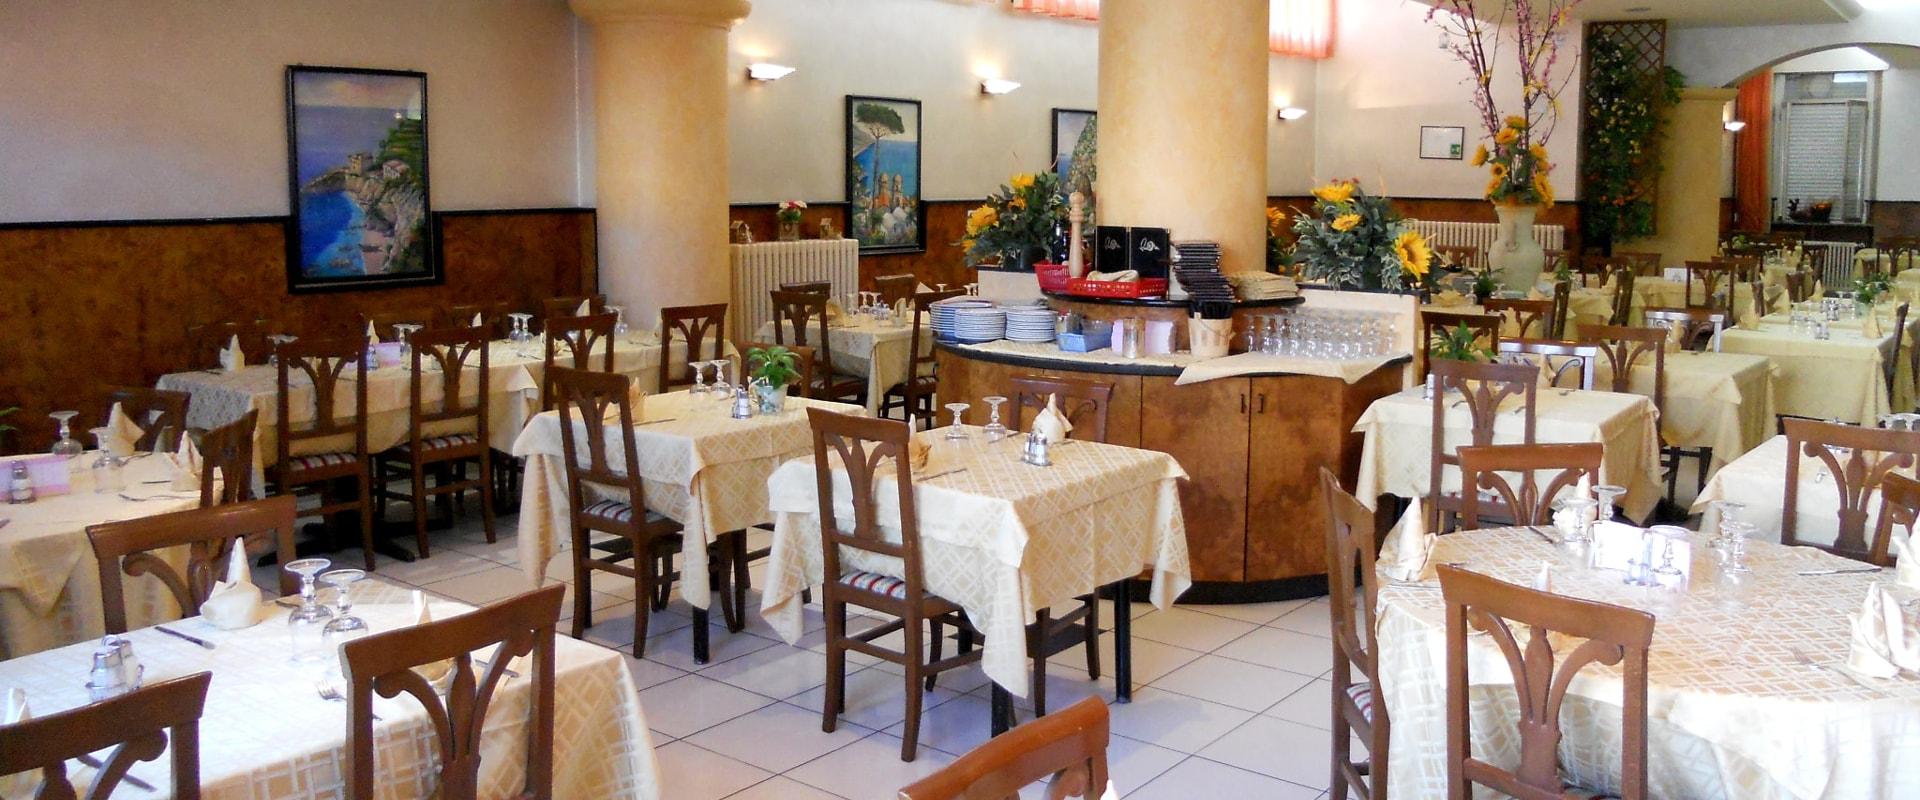 Ristorante-Pizzeria-La-Ruota-Gallarate-Sala-Ricevimenti